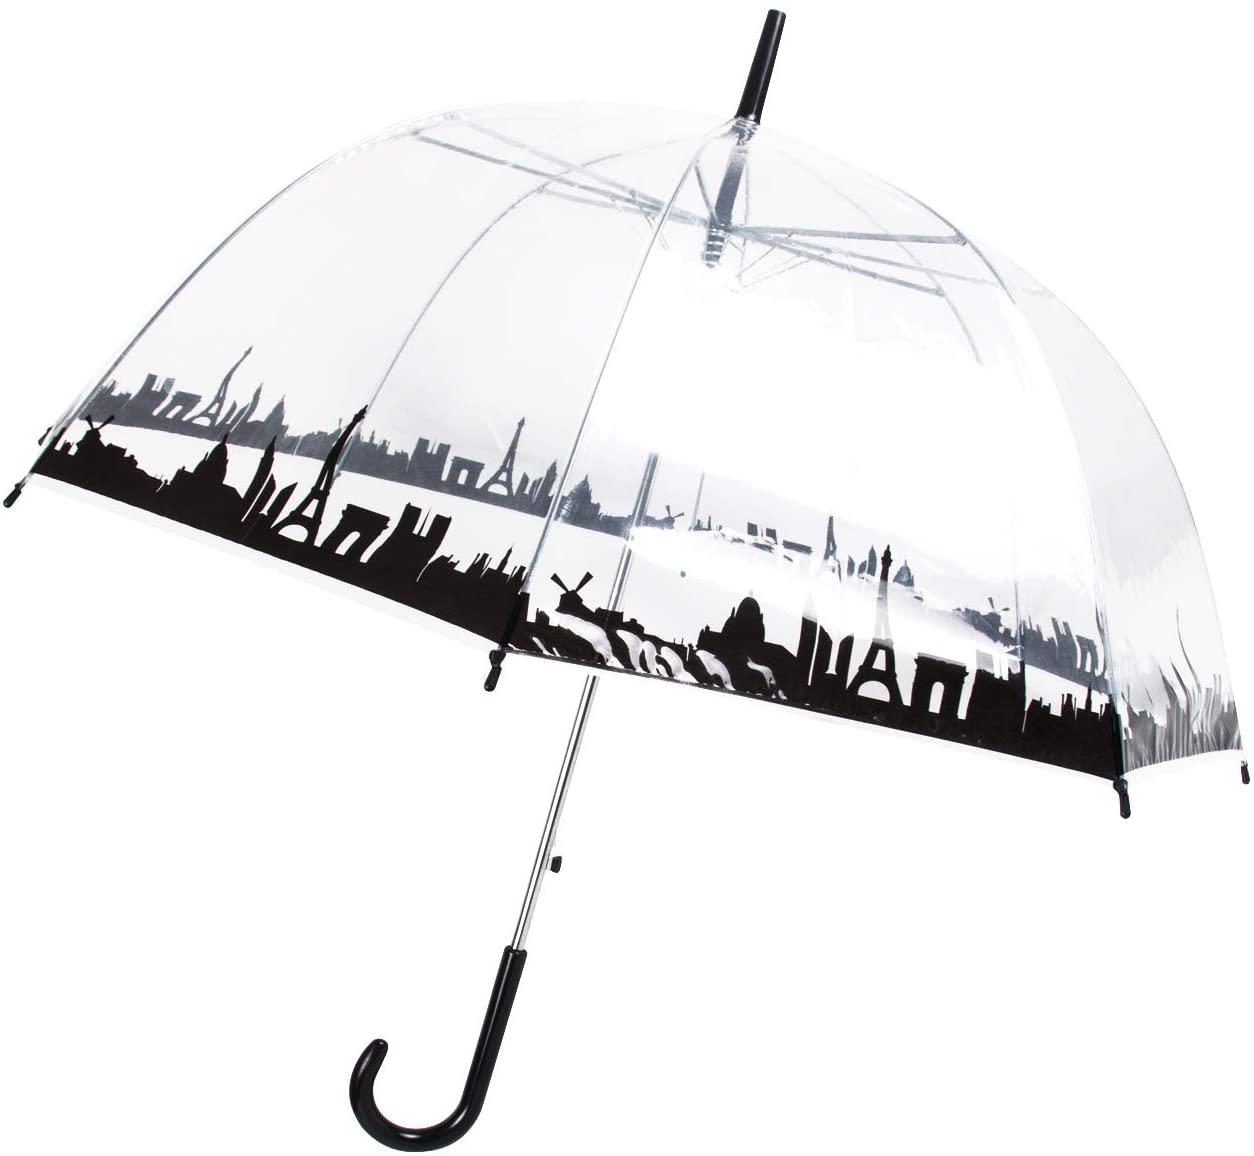 Lancoon Paraguas transparente grande para novia o esposa con forma de cúpula B